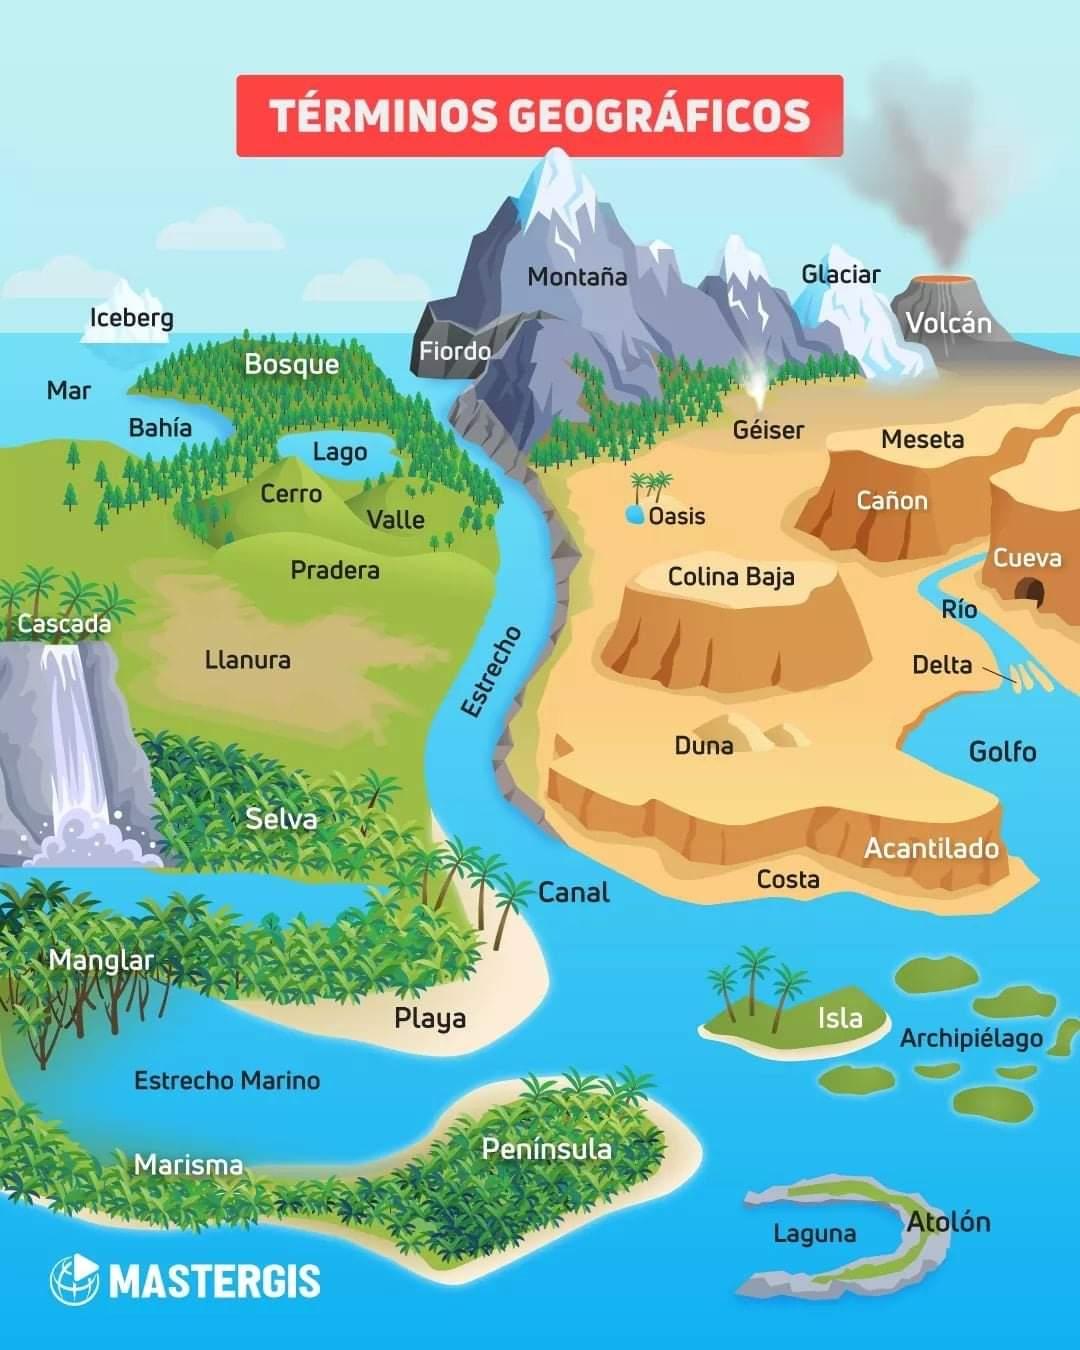 Términos geográficos